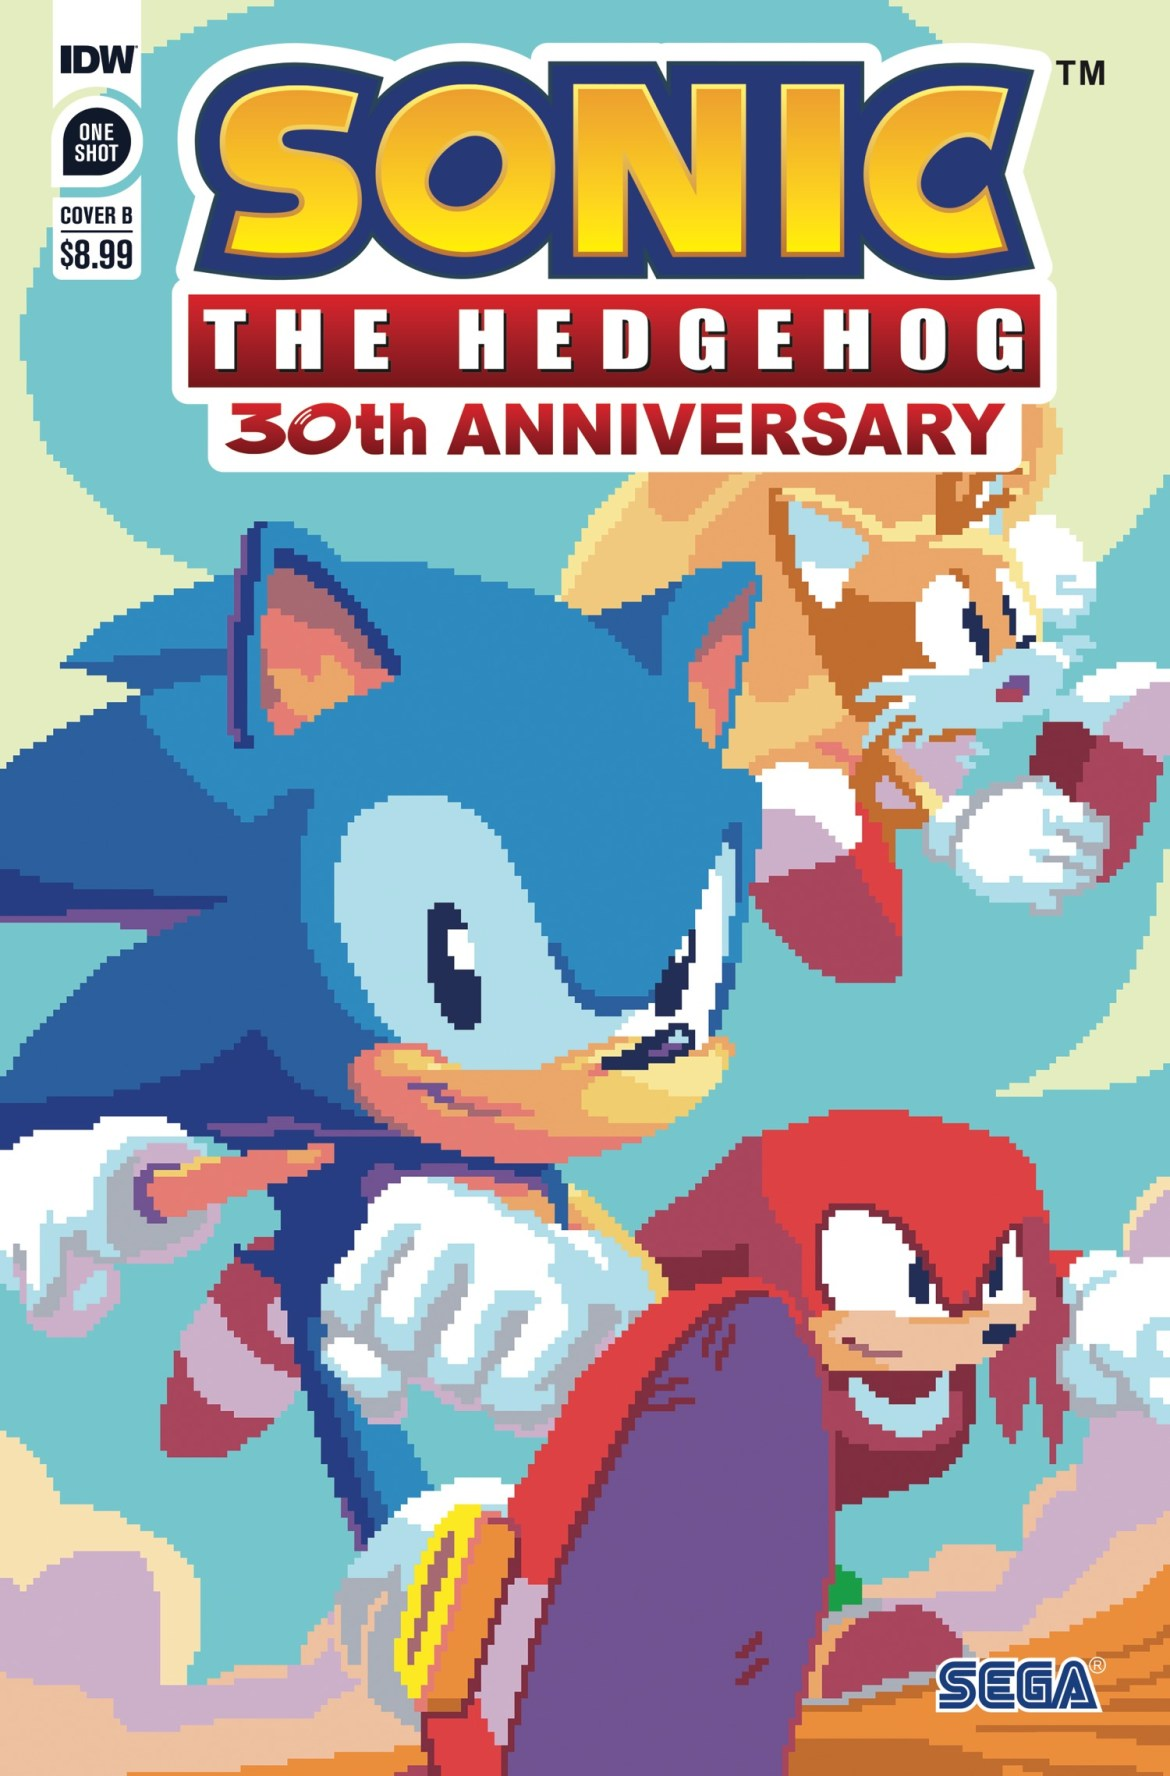 28ff50ee-c730-4b1d-8095-6592b8070969 IDW Publishing celebrates 30th anniversary of Sonic The Hedgehog